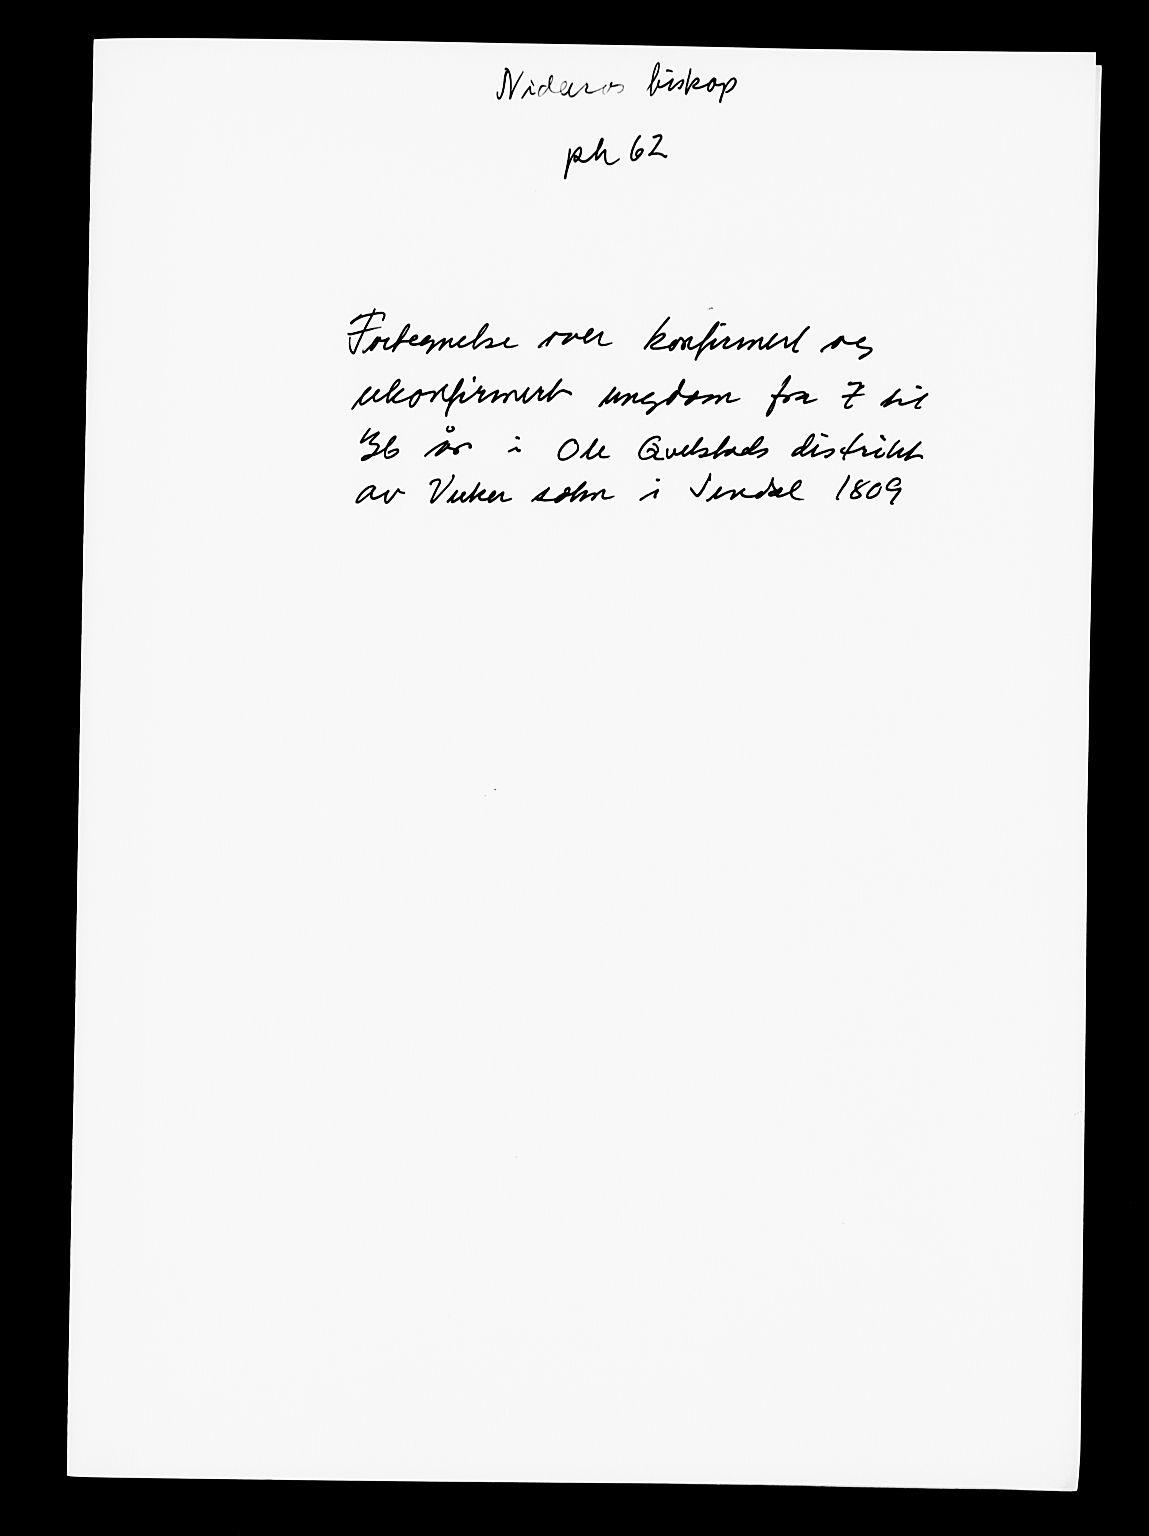 SAT, Nidaros biskop*, 1809, s. upaginert